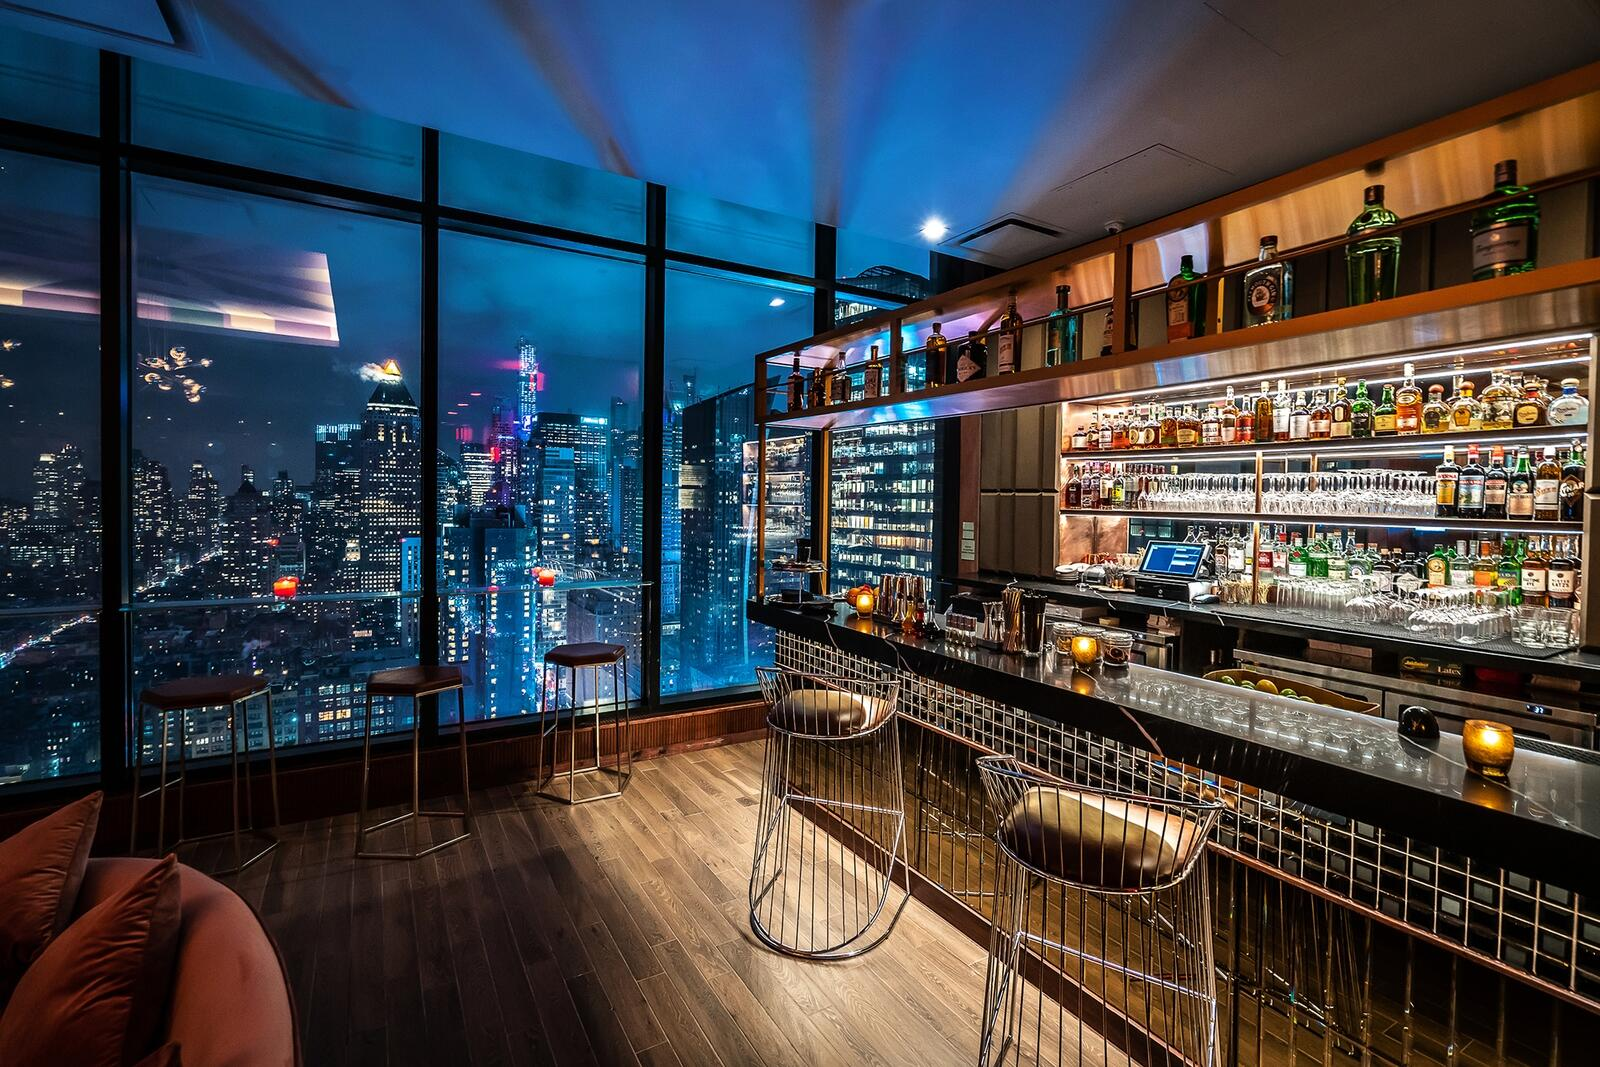 bar with stools and new york city skyline through the windows